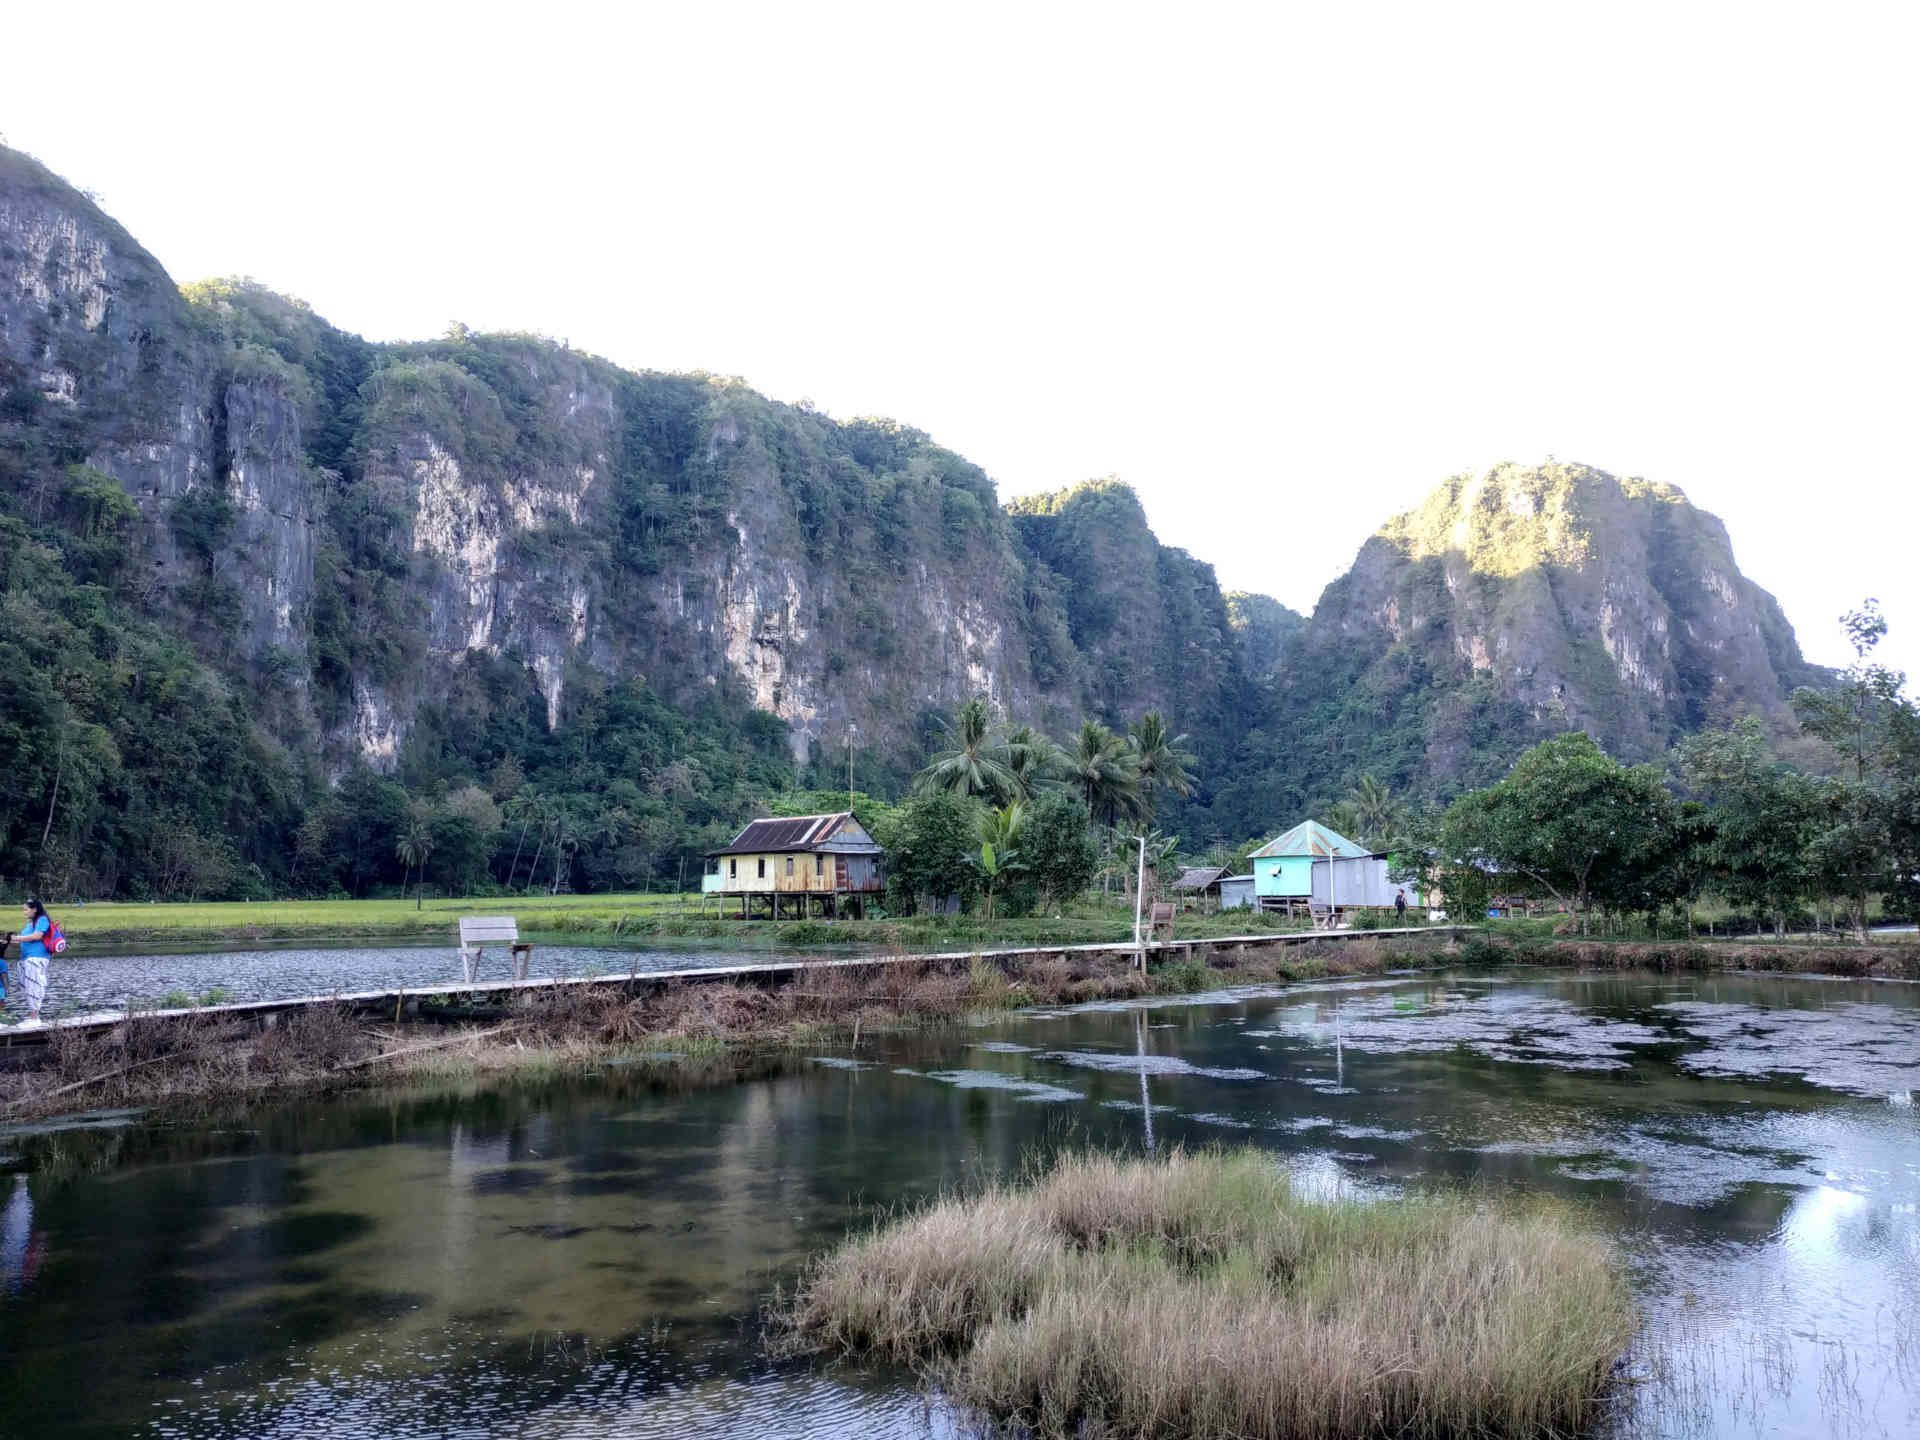 Sulawesi Maros Cave Exploration 1